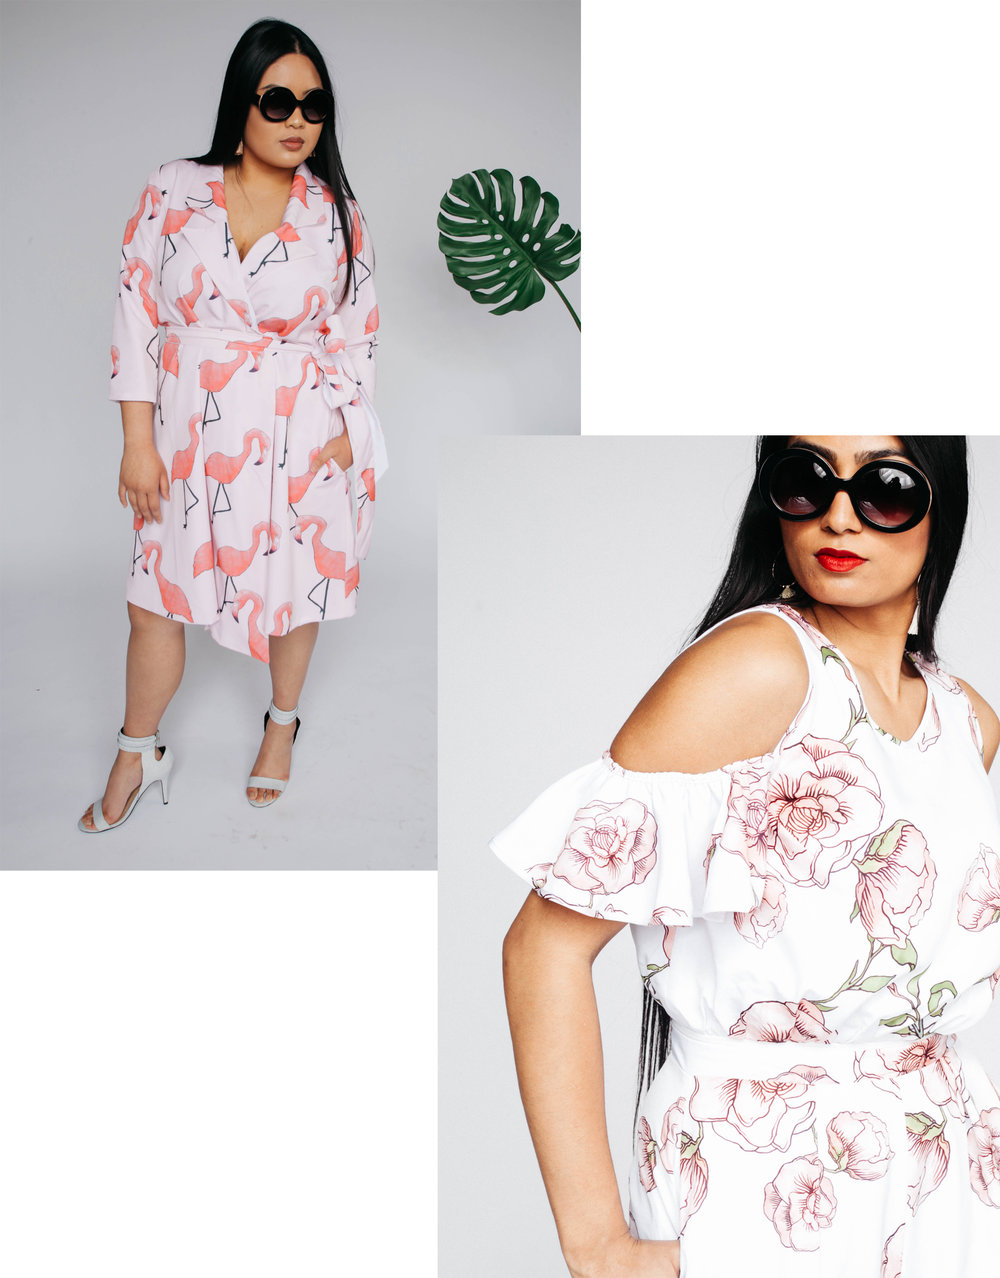 dona paula 2017 carolyn tripp fashion textile design